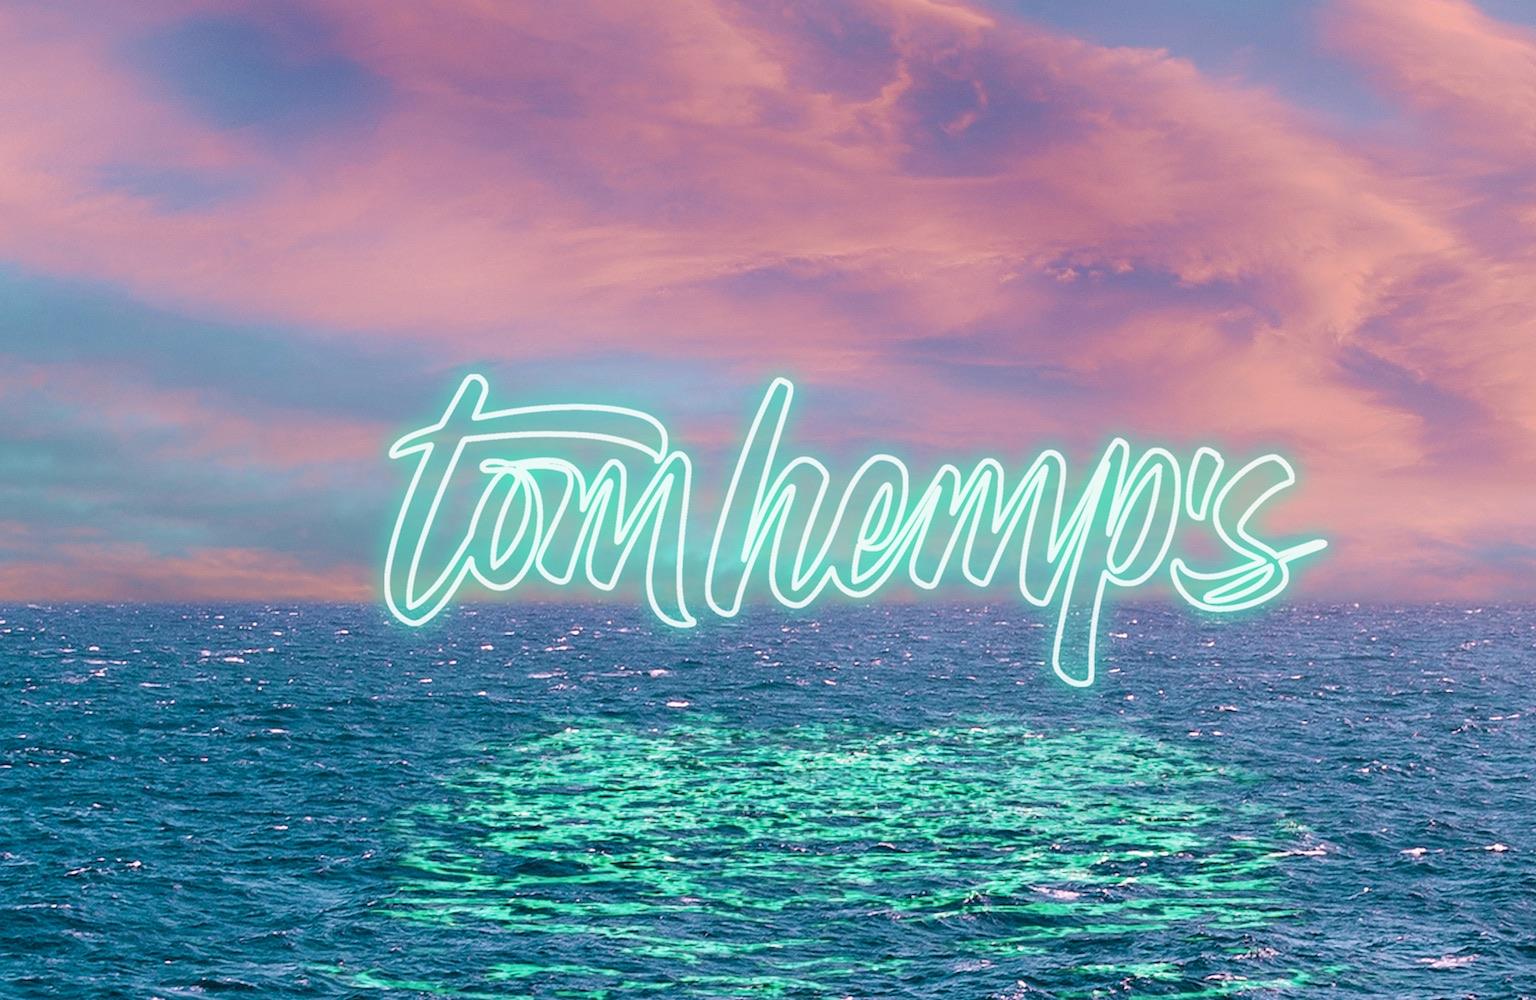 Tom Hemps Header Logo Clouds